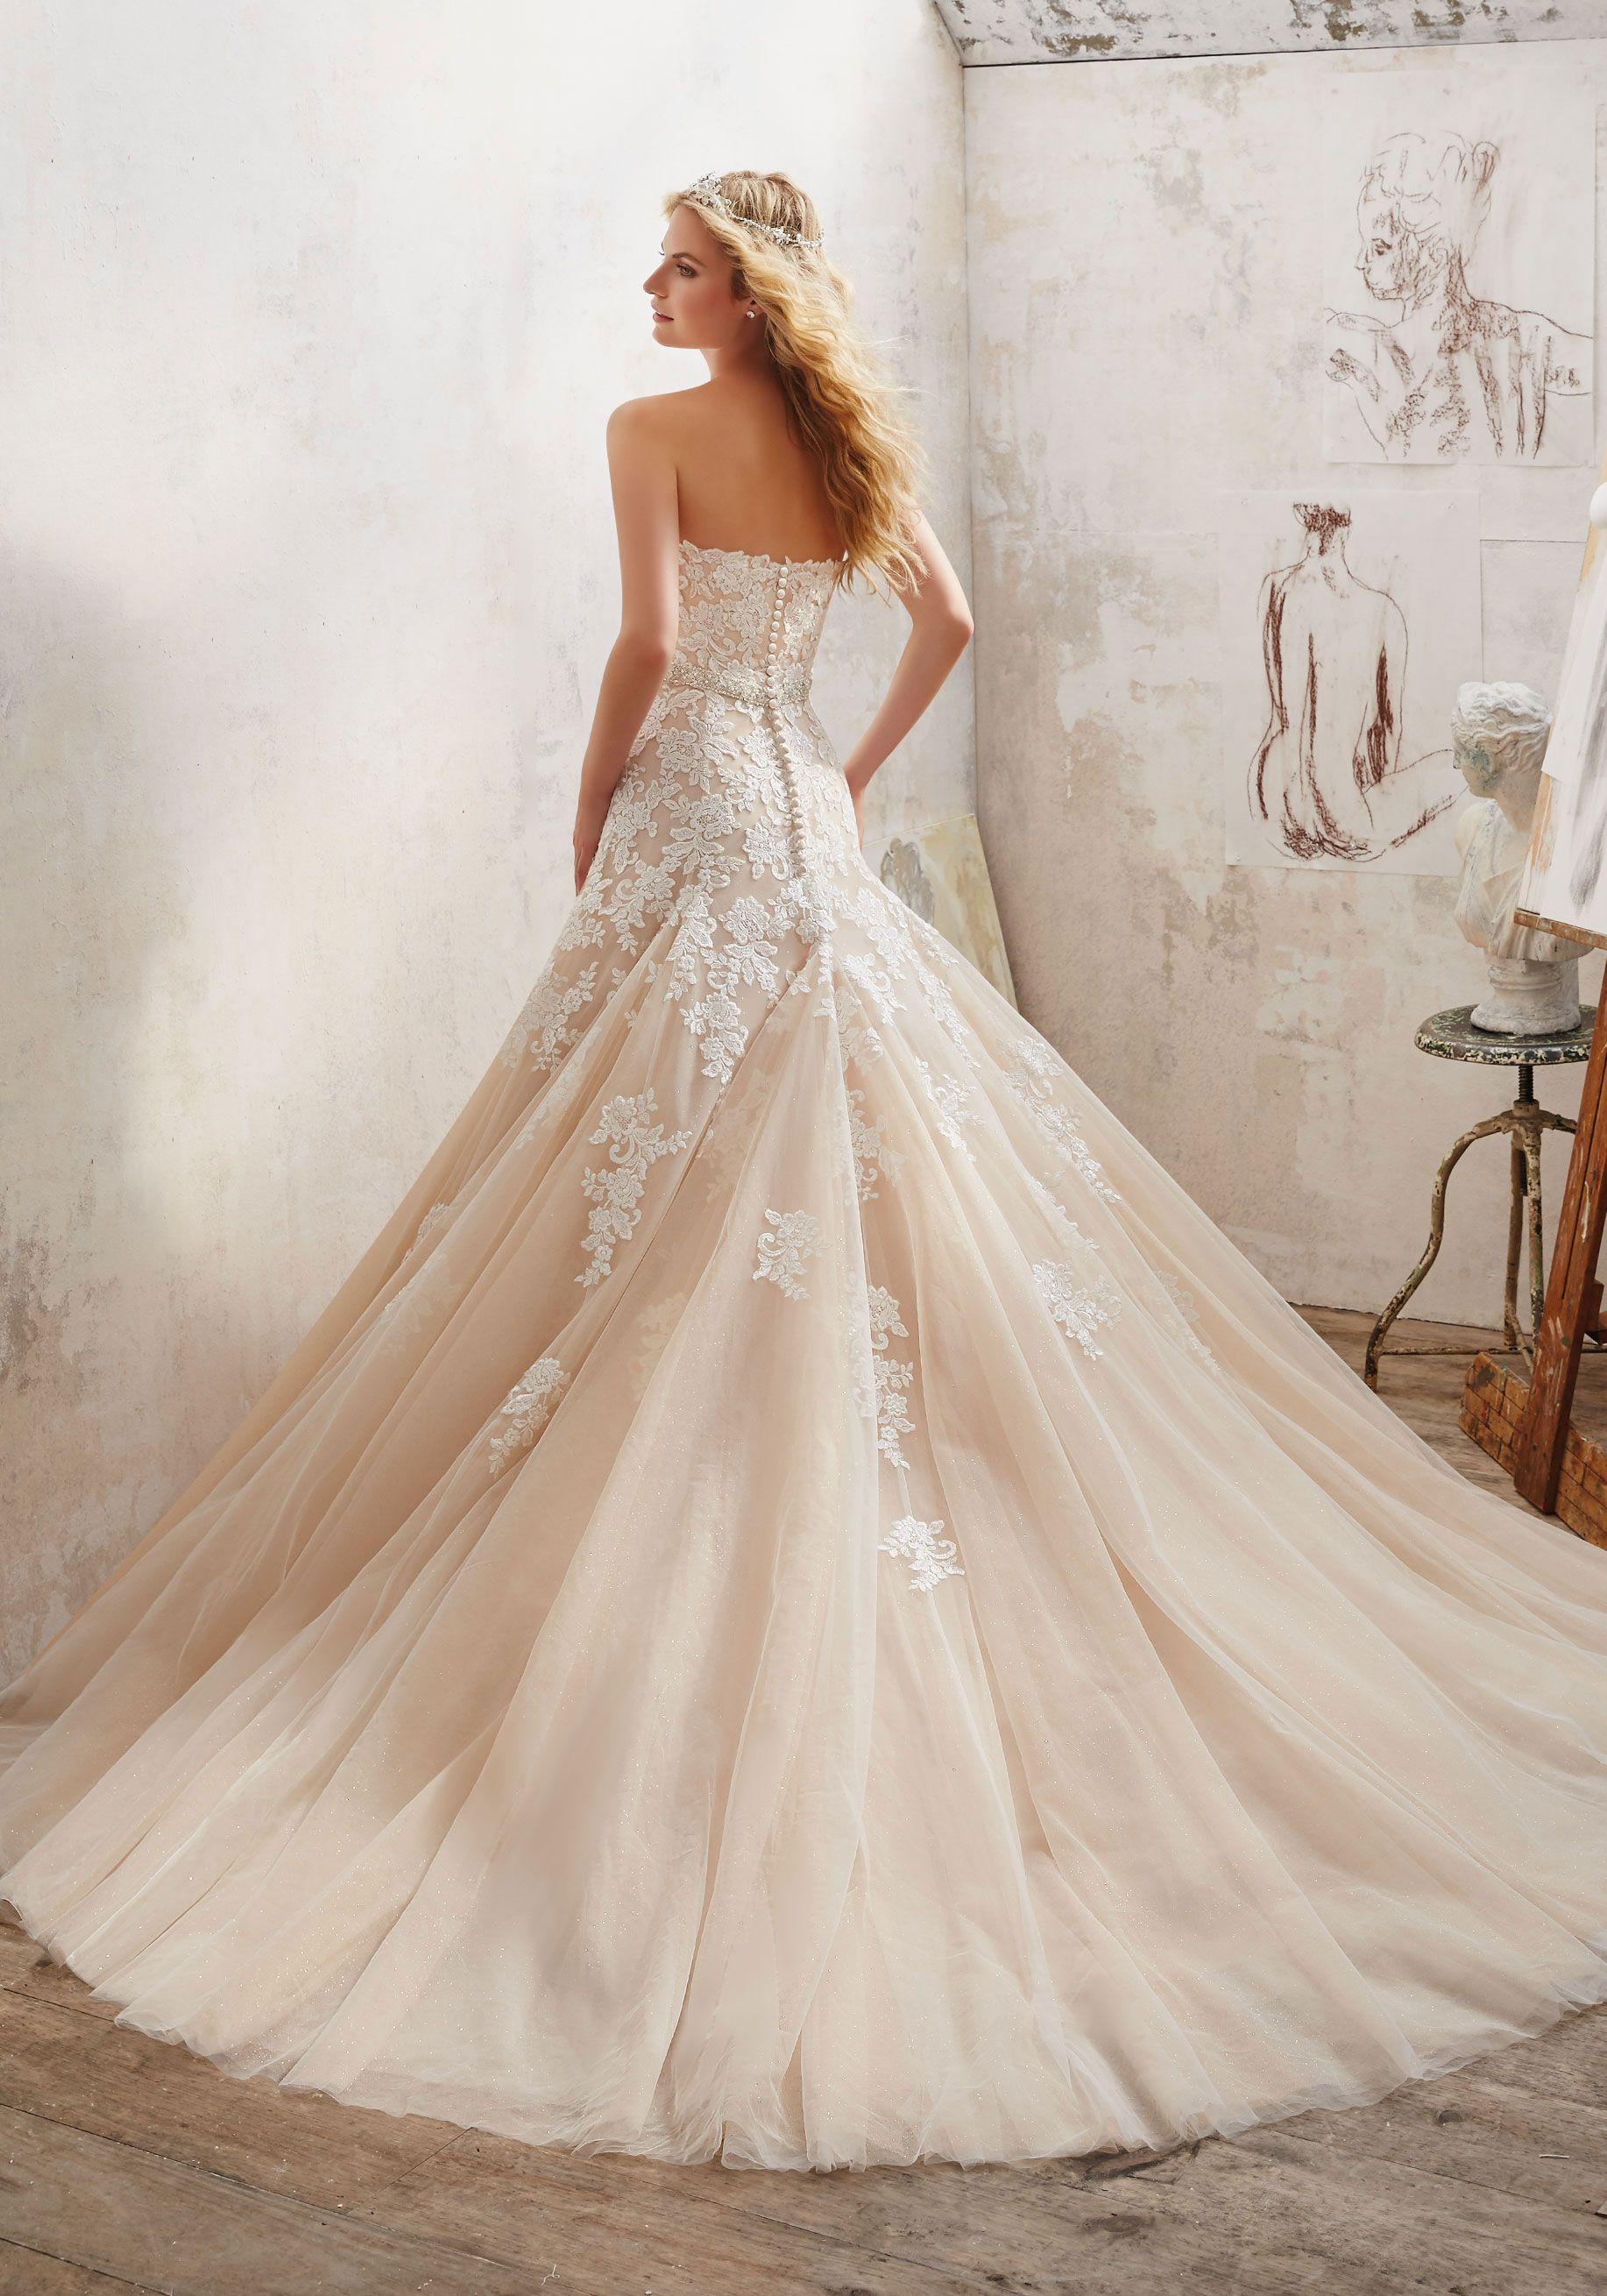 Mackenzie Wedding Dress Morilee Mori Lee Wedding Dress Bridal Wedding Dresses Wedding Dresses